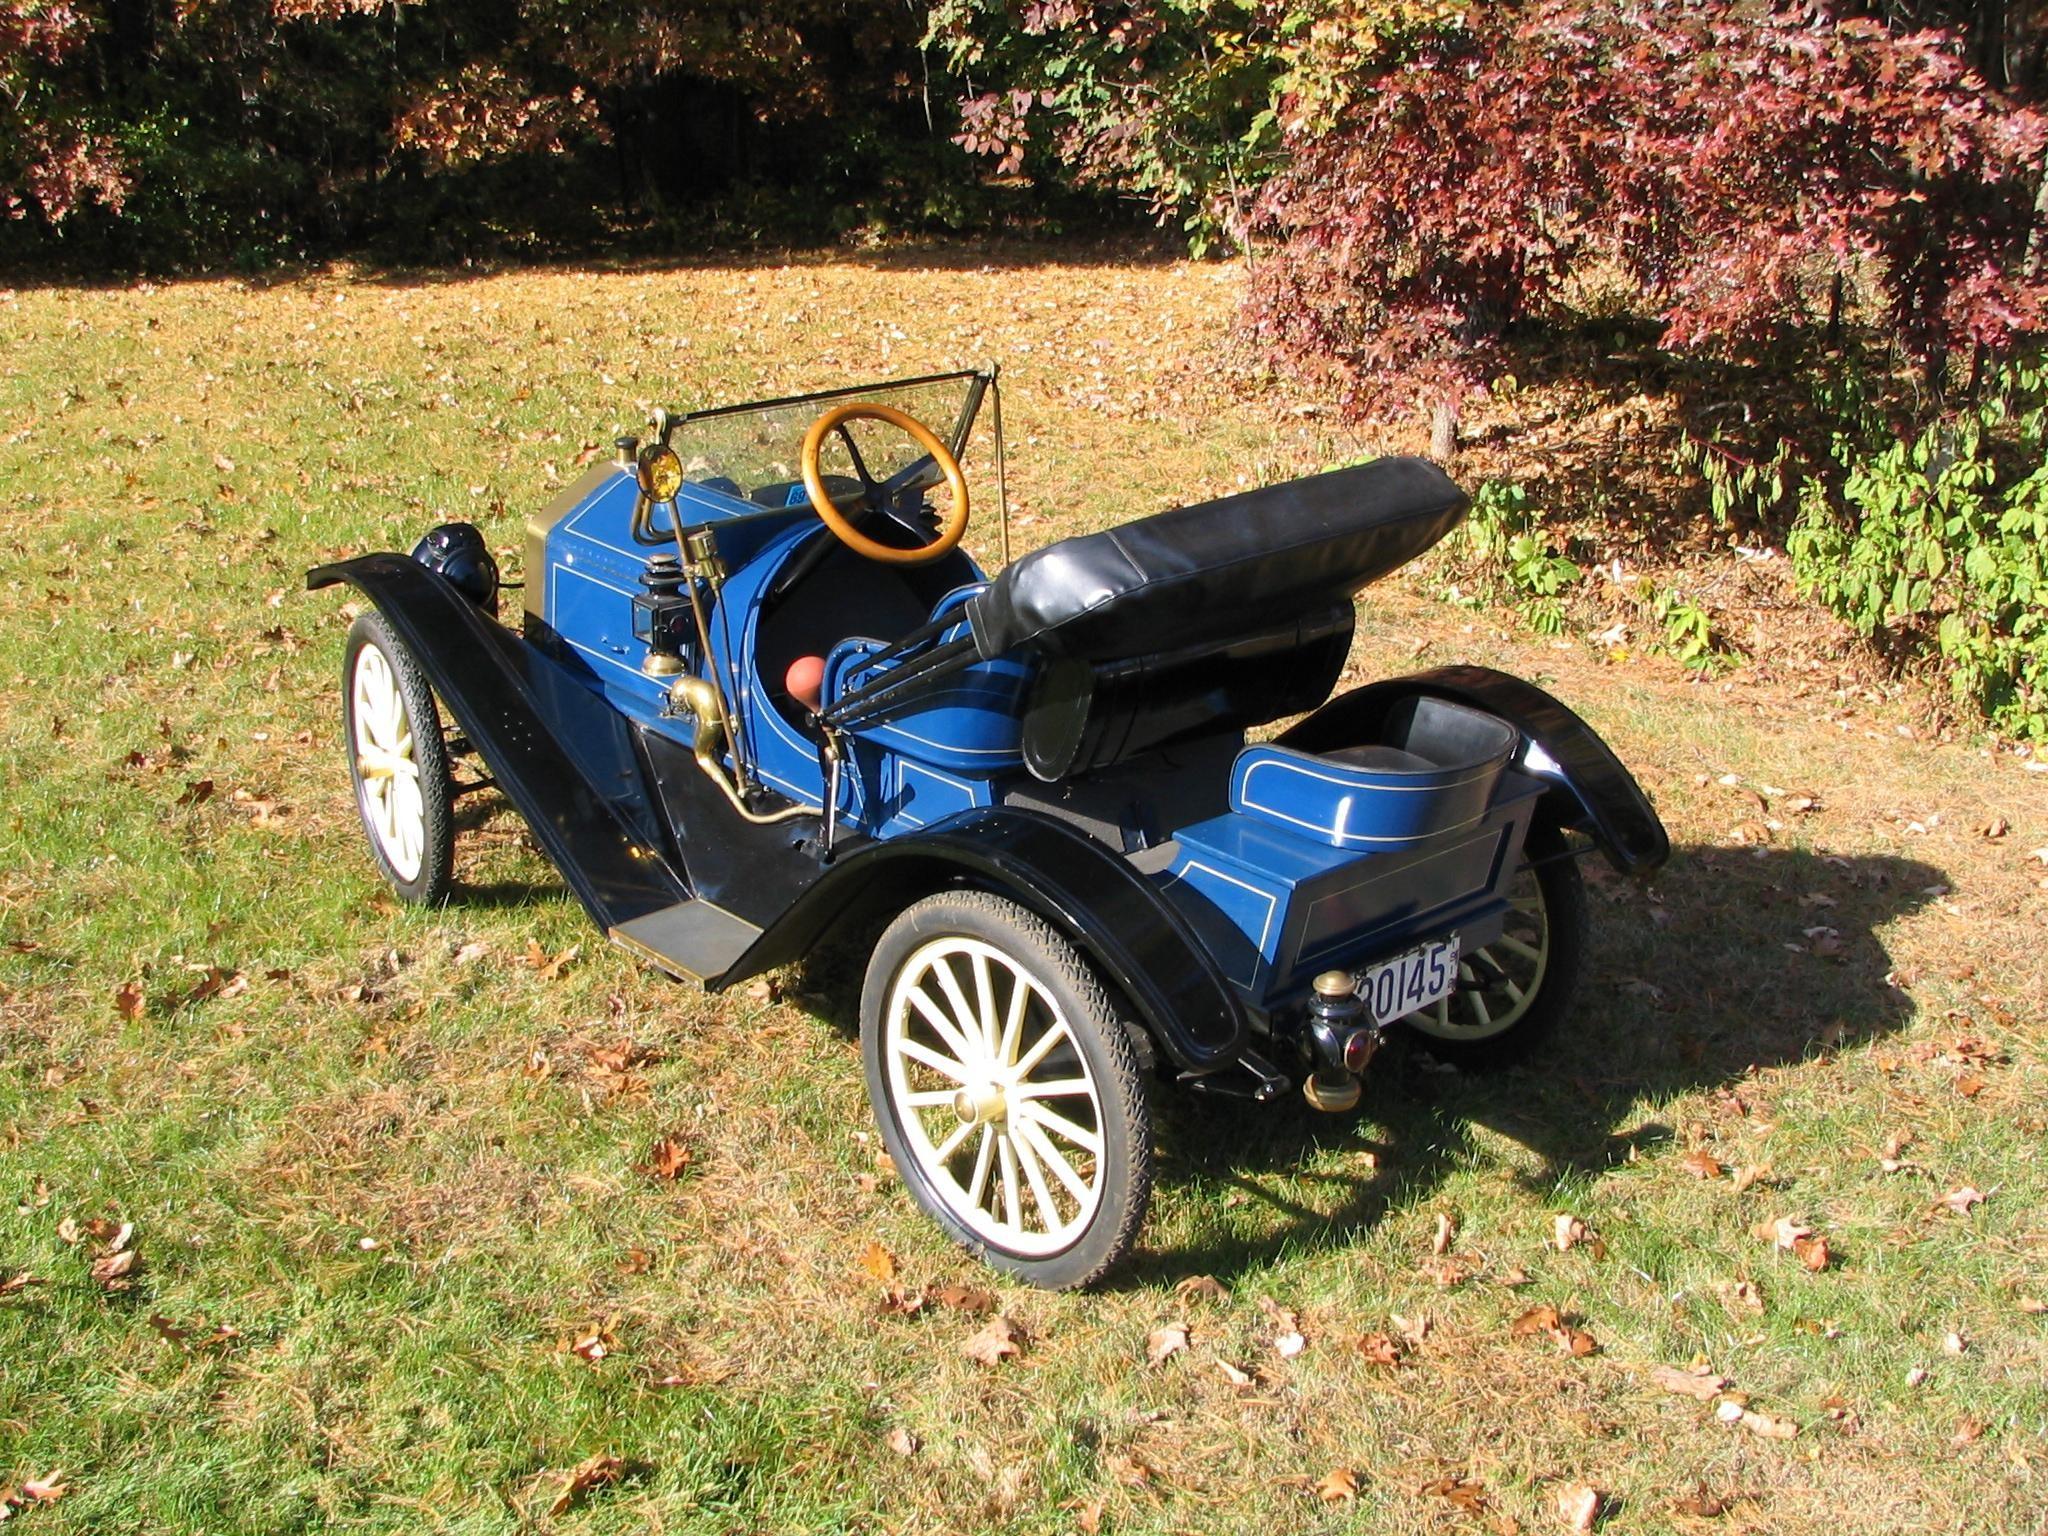 1912 metz 22 roadster 17547 metz waltham automobiles motorcycles bicycles air car. Black Bedroom Furniture Sets. Home Design Ideas